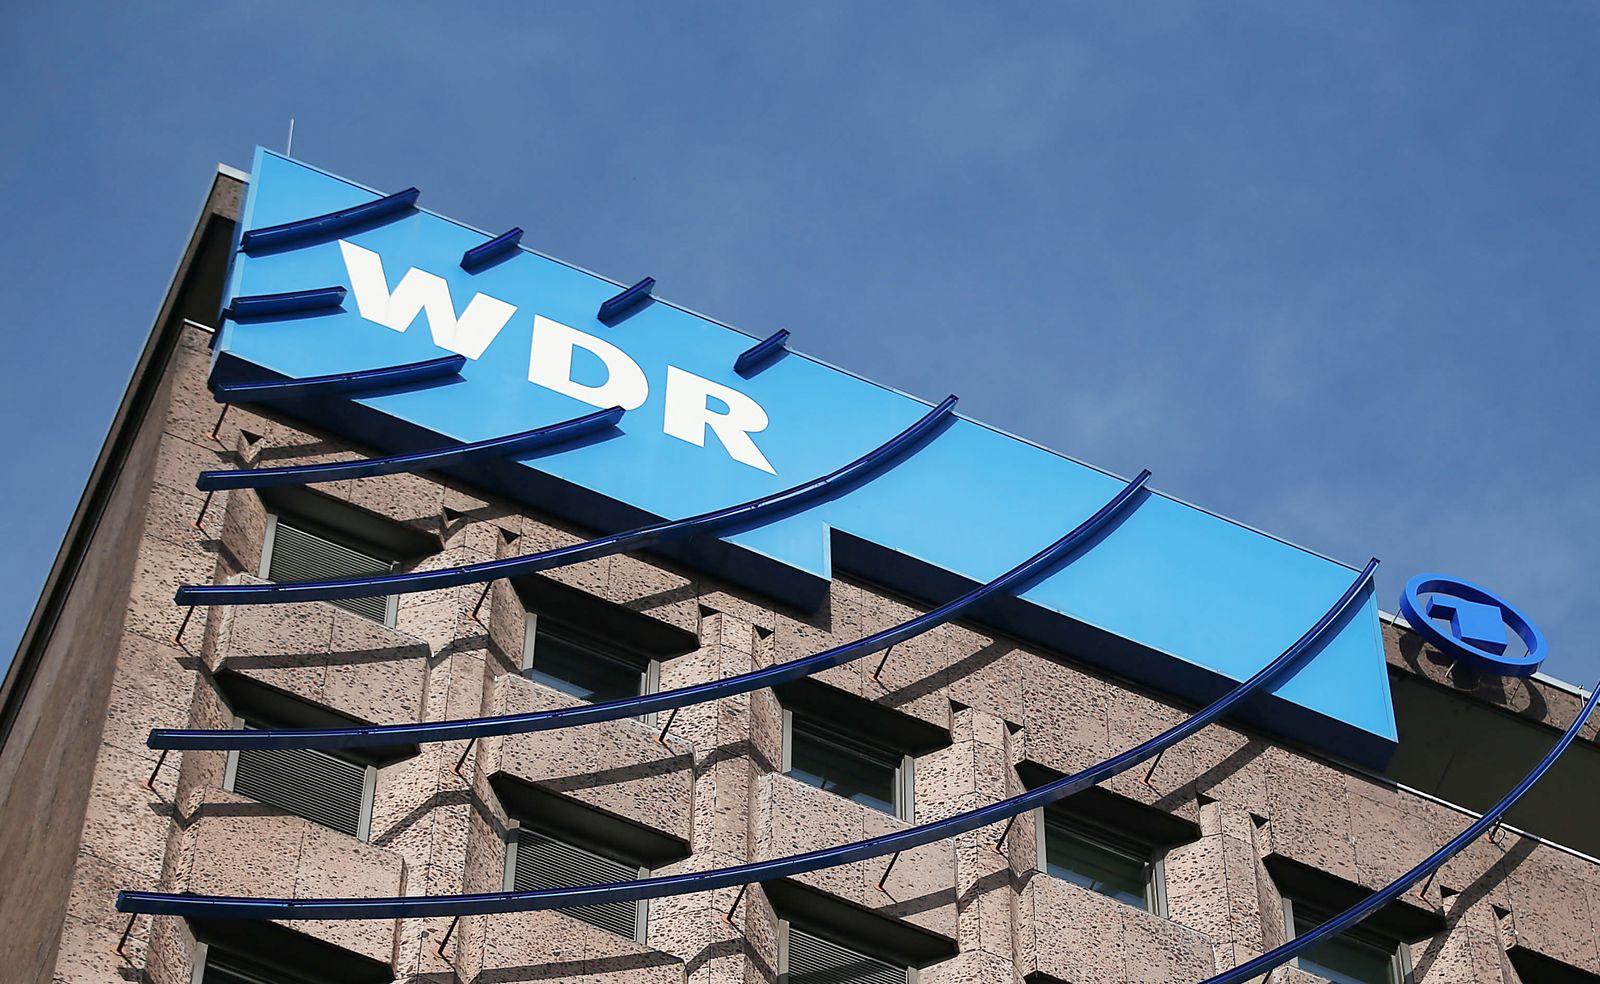 WDR / Köln